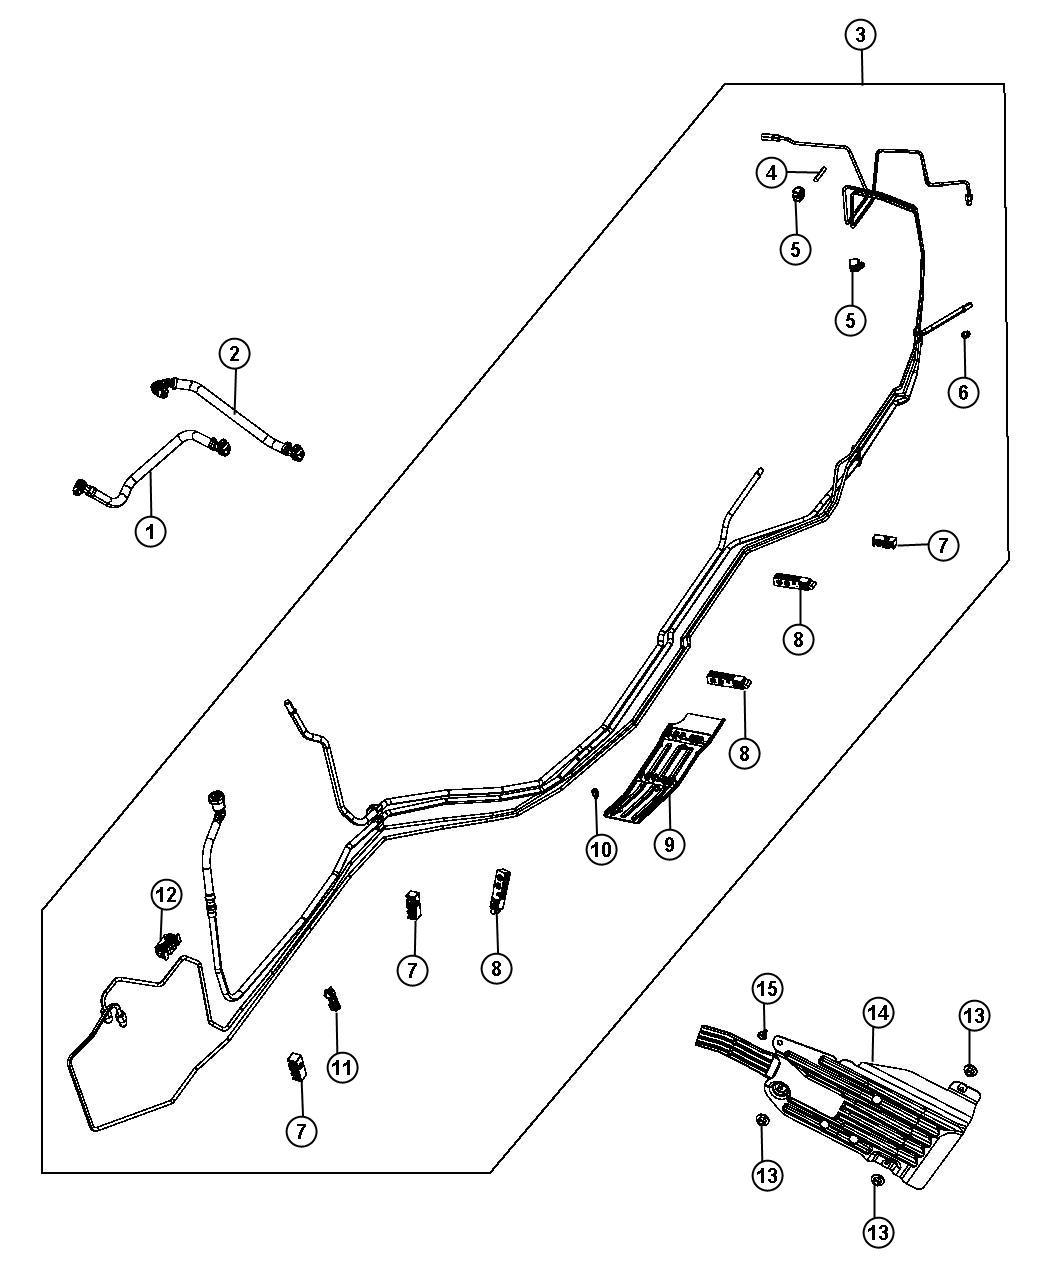 2013 Dodge Durango Clip. 2 way. Brake tube. Fuel, lines